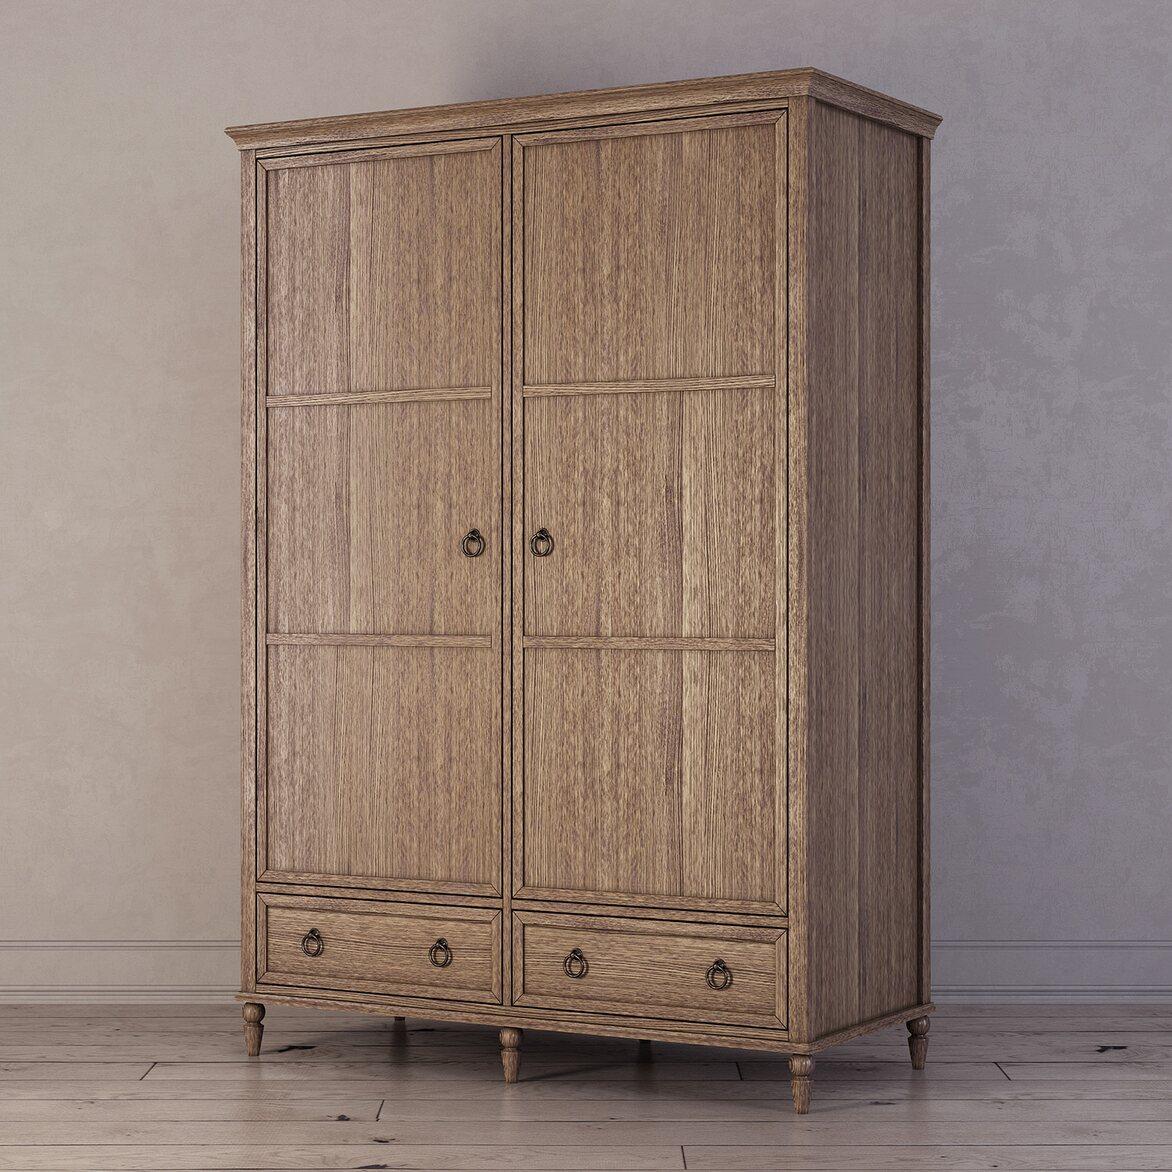 Шкаф двухстворчатый Vilton, дуб 2 | Платяные шкафы Kingsby